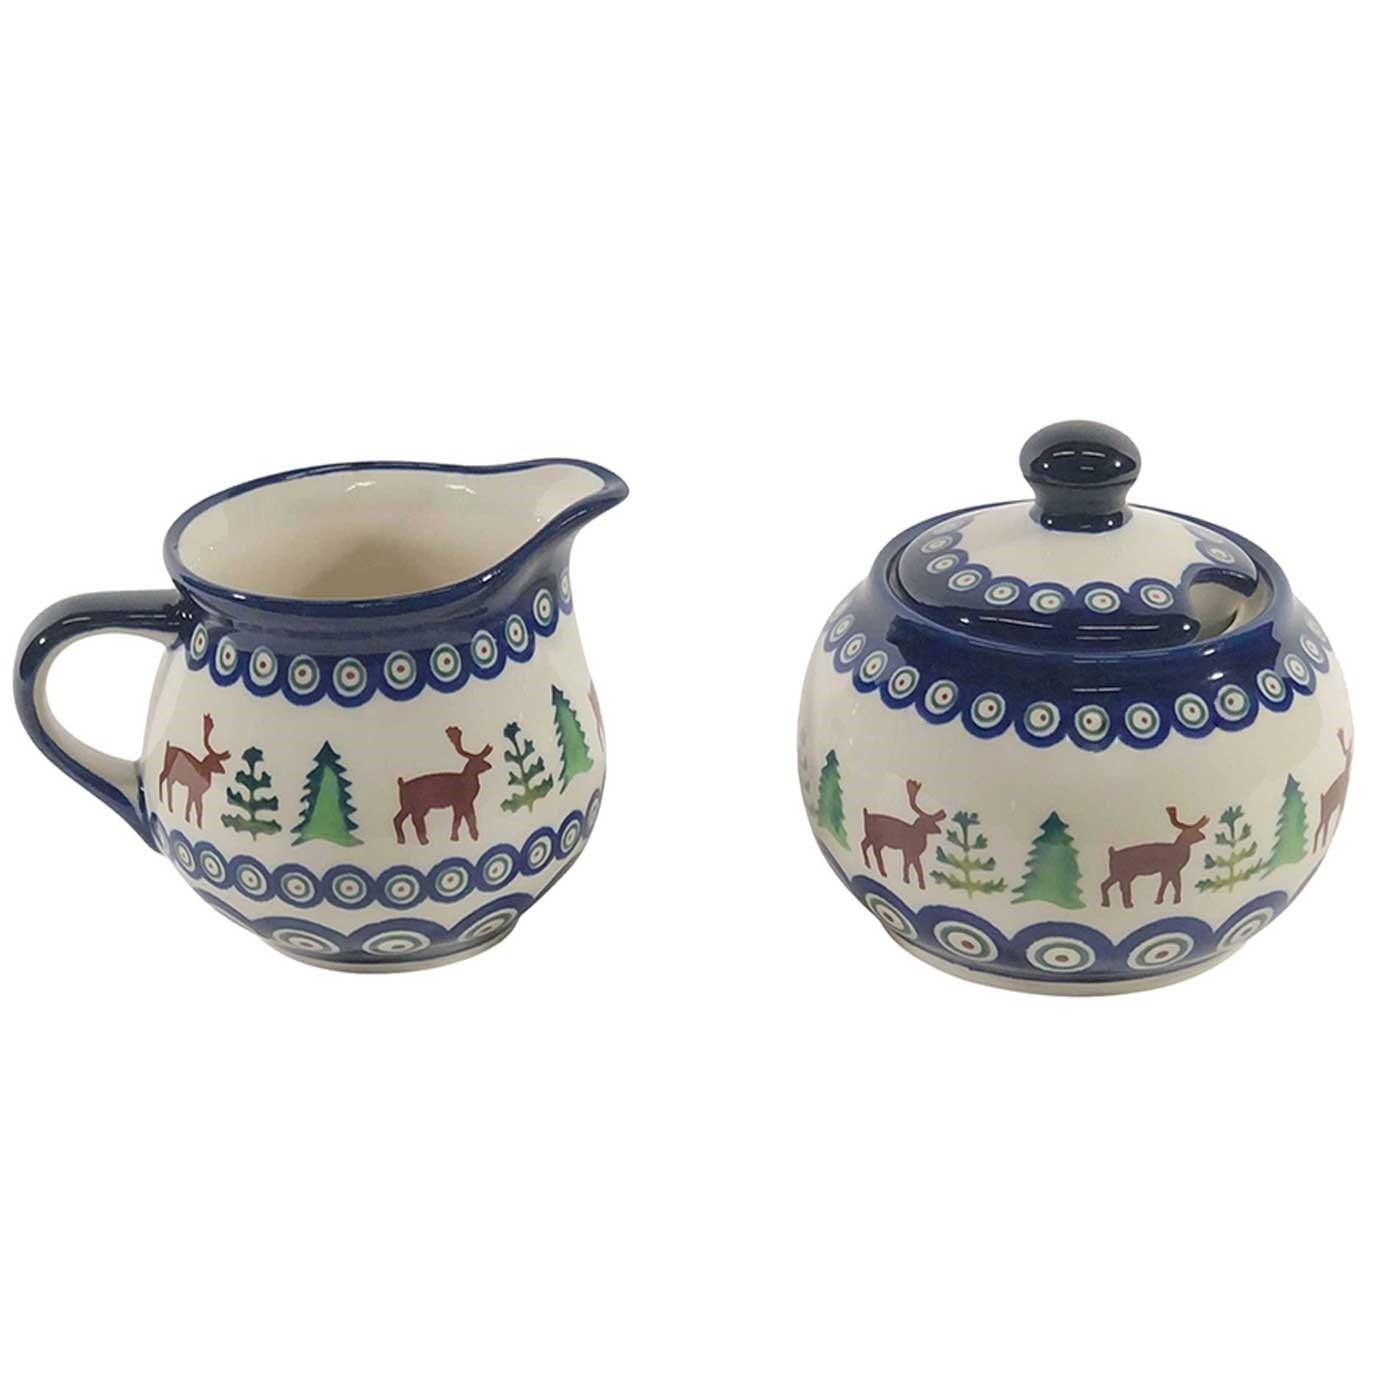 Pottery Avenue Caribou Lodge Stoneware Cream and Sugar Bowl